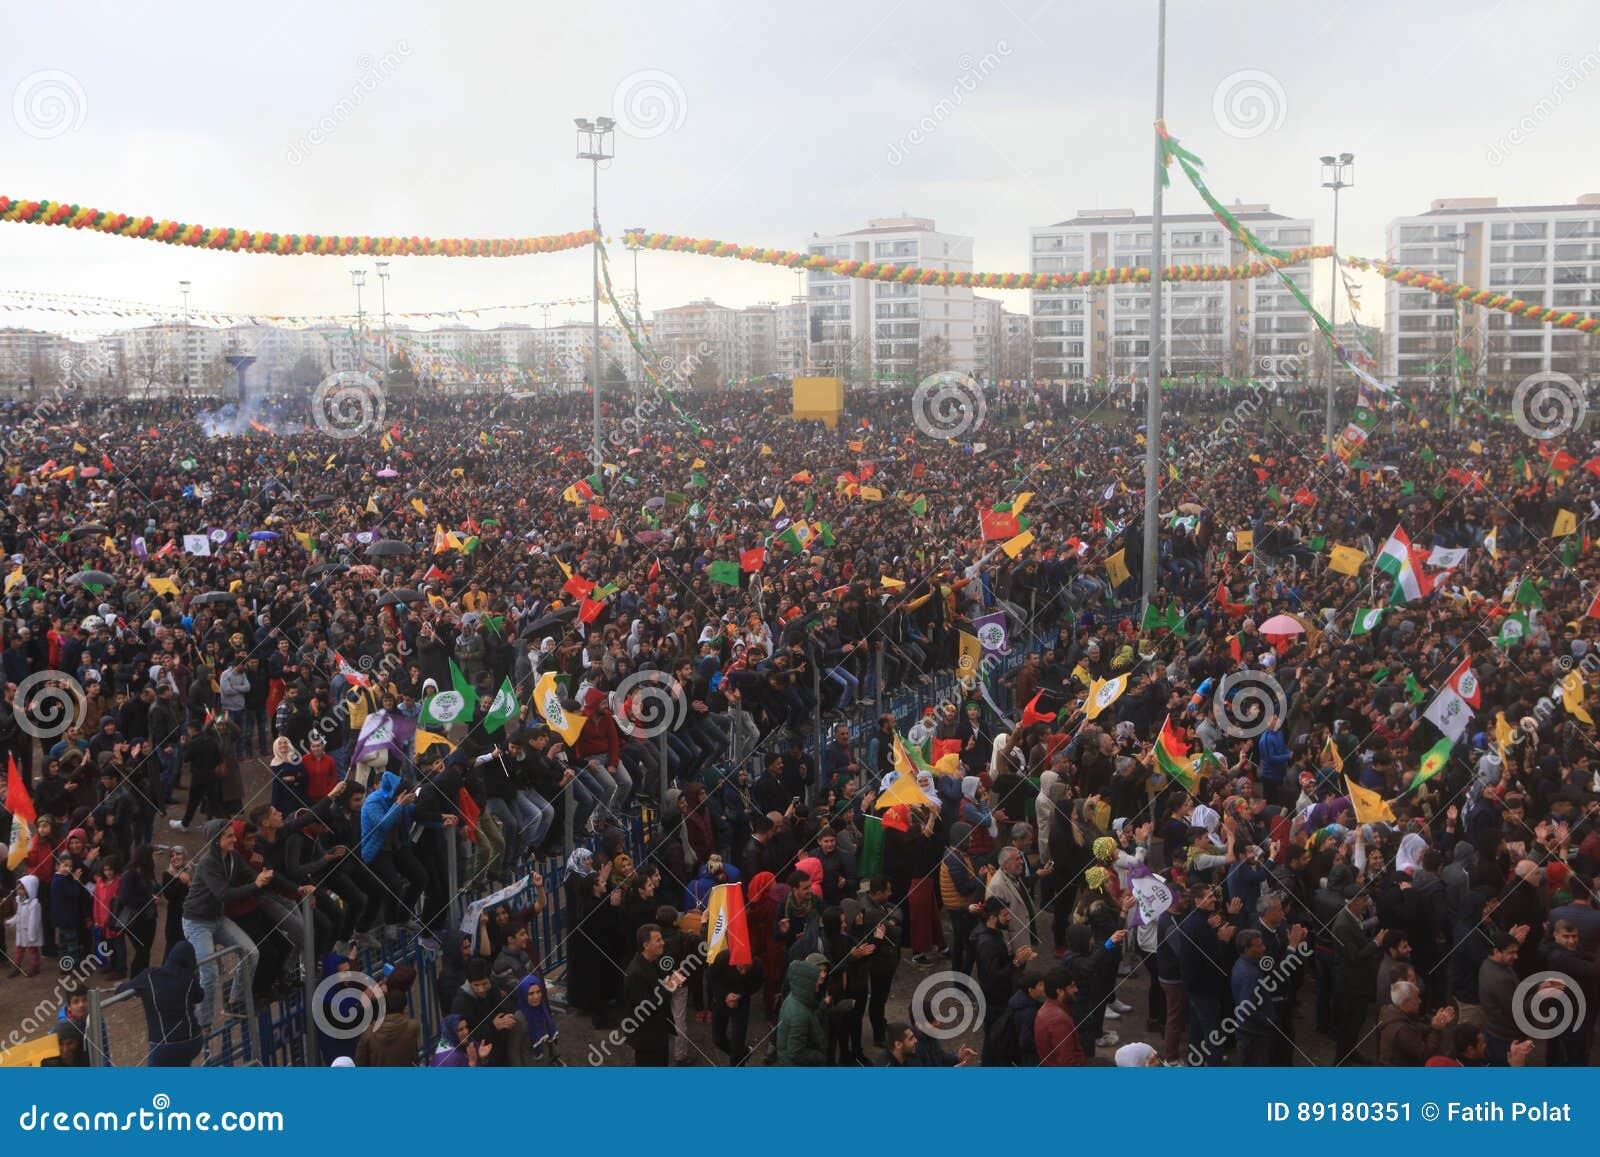 newroz à diyarbakir, turquie photo éditorial - image du foule, régal